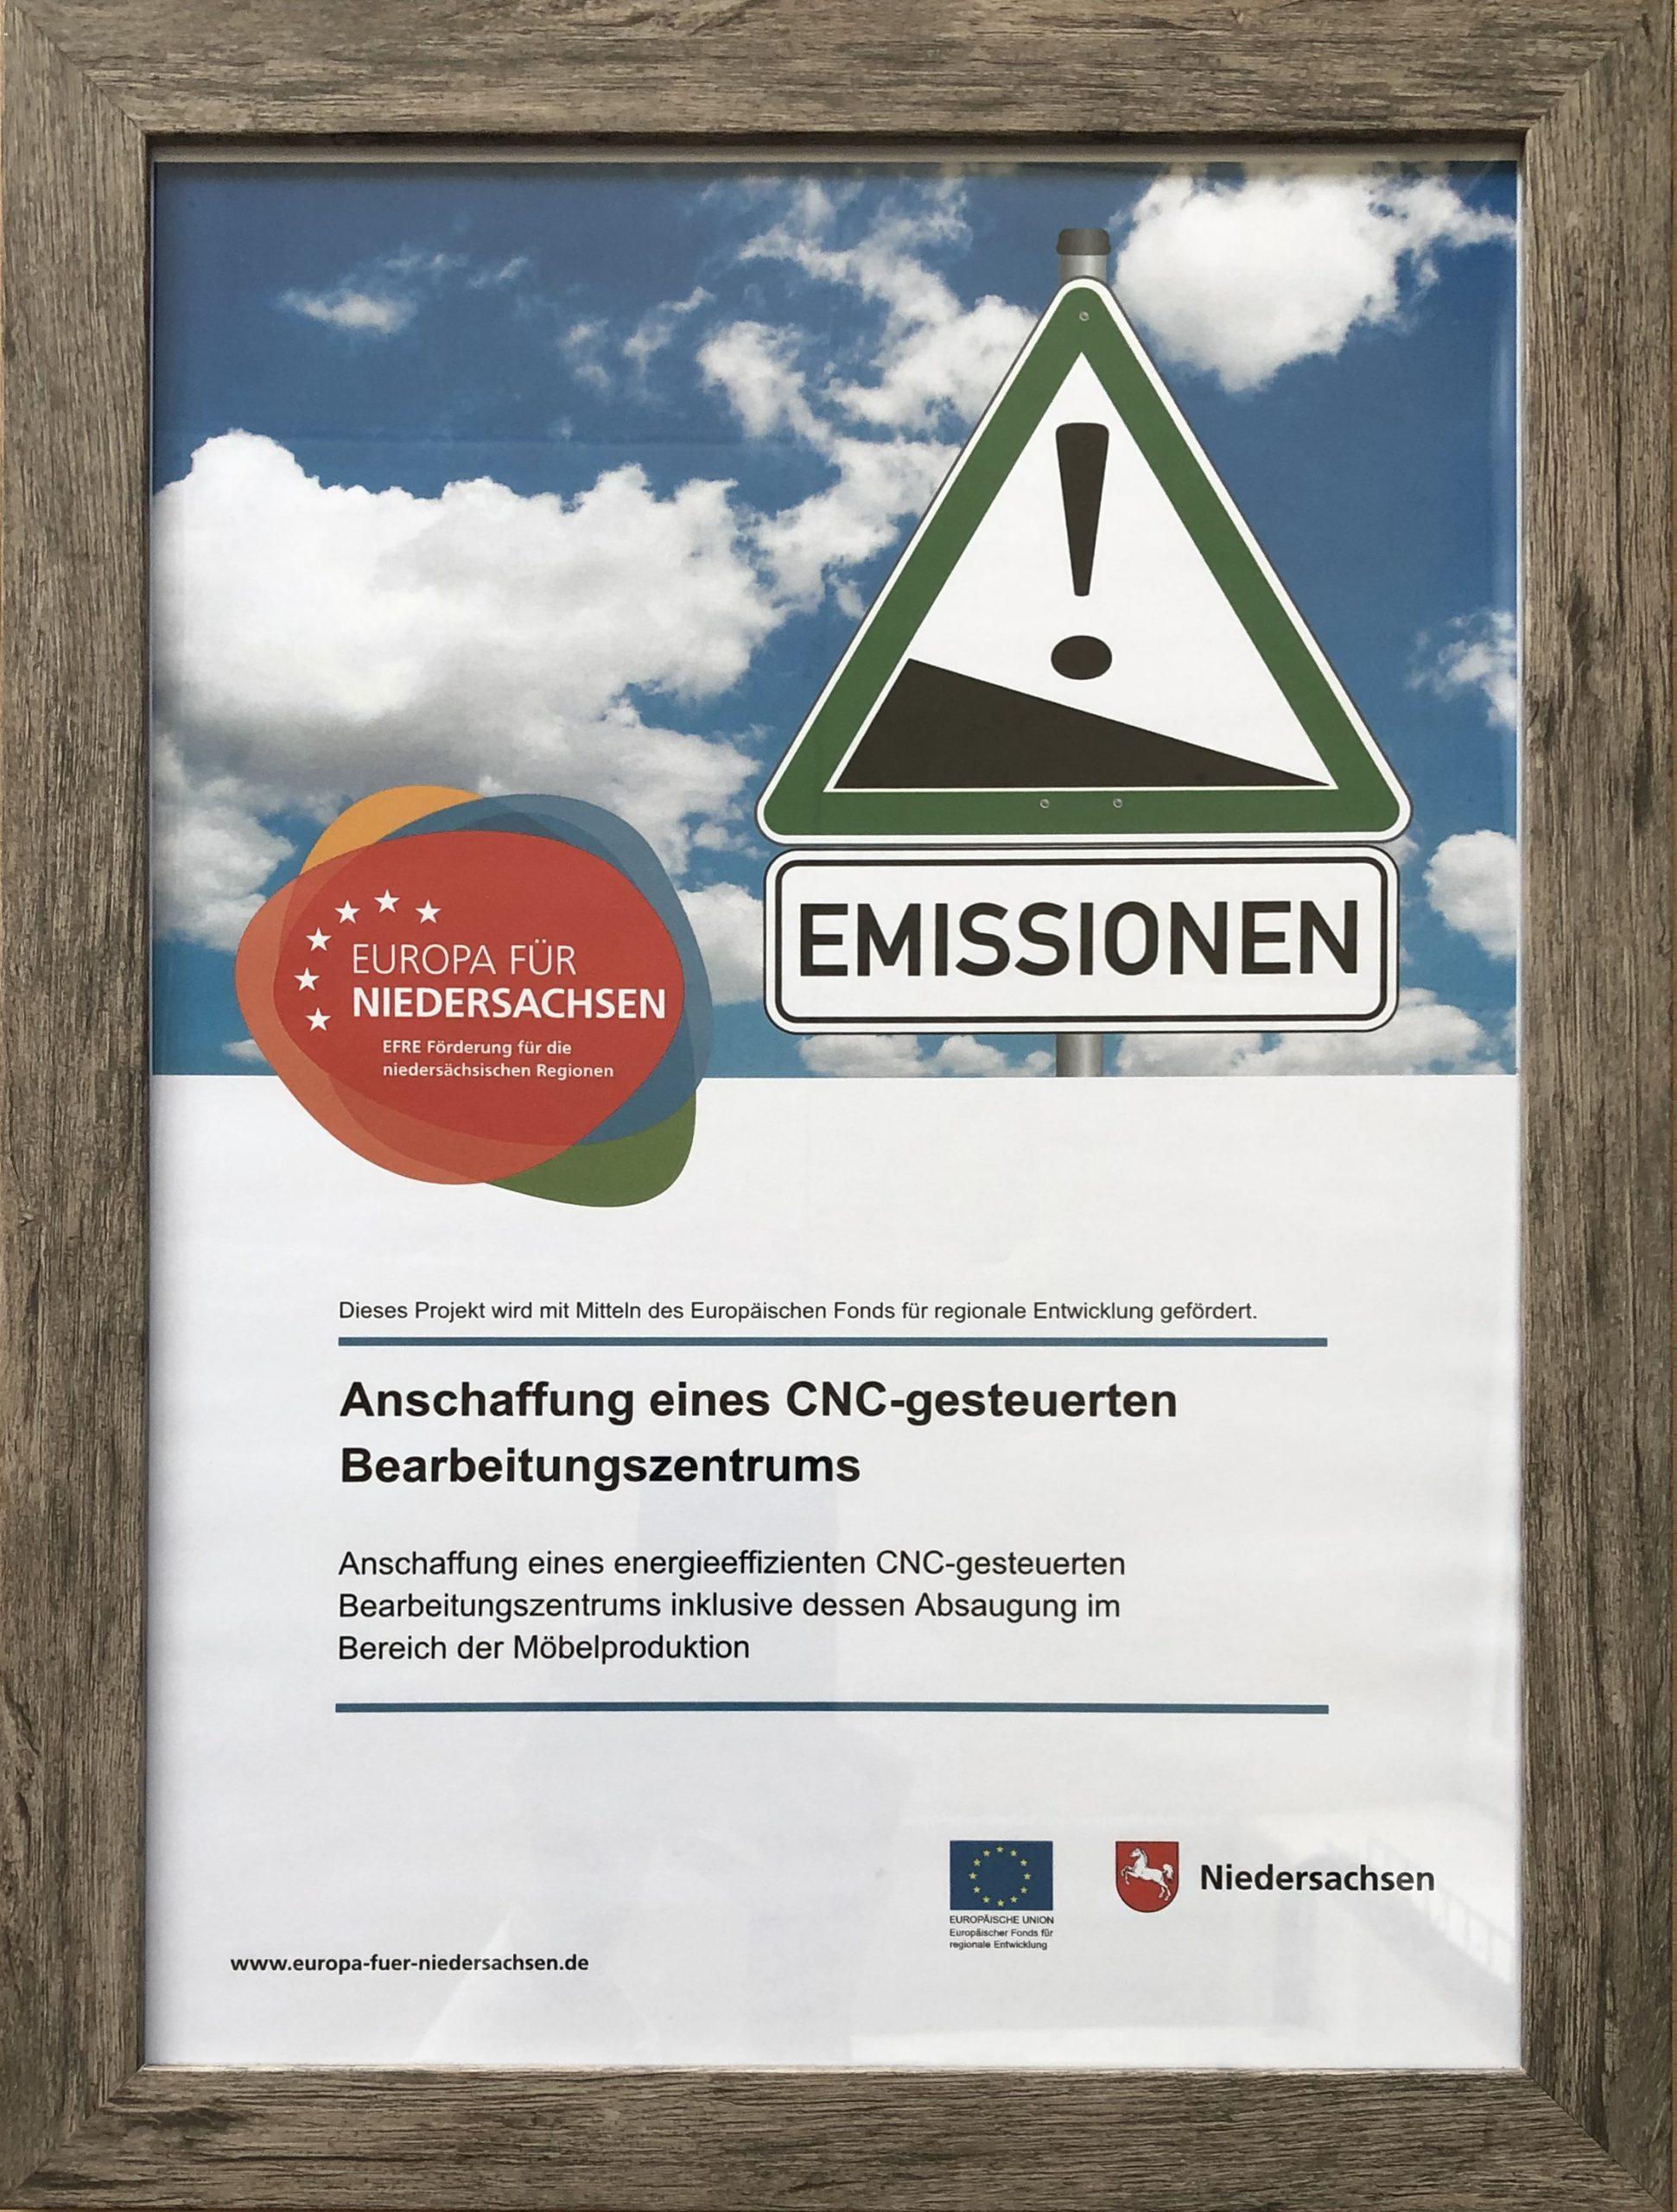 Foerderprojekt 2020 Plakat CNC-gesteuerte Bearbeitungszentrum Tischlerei Peter Bruemmer